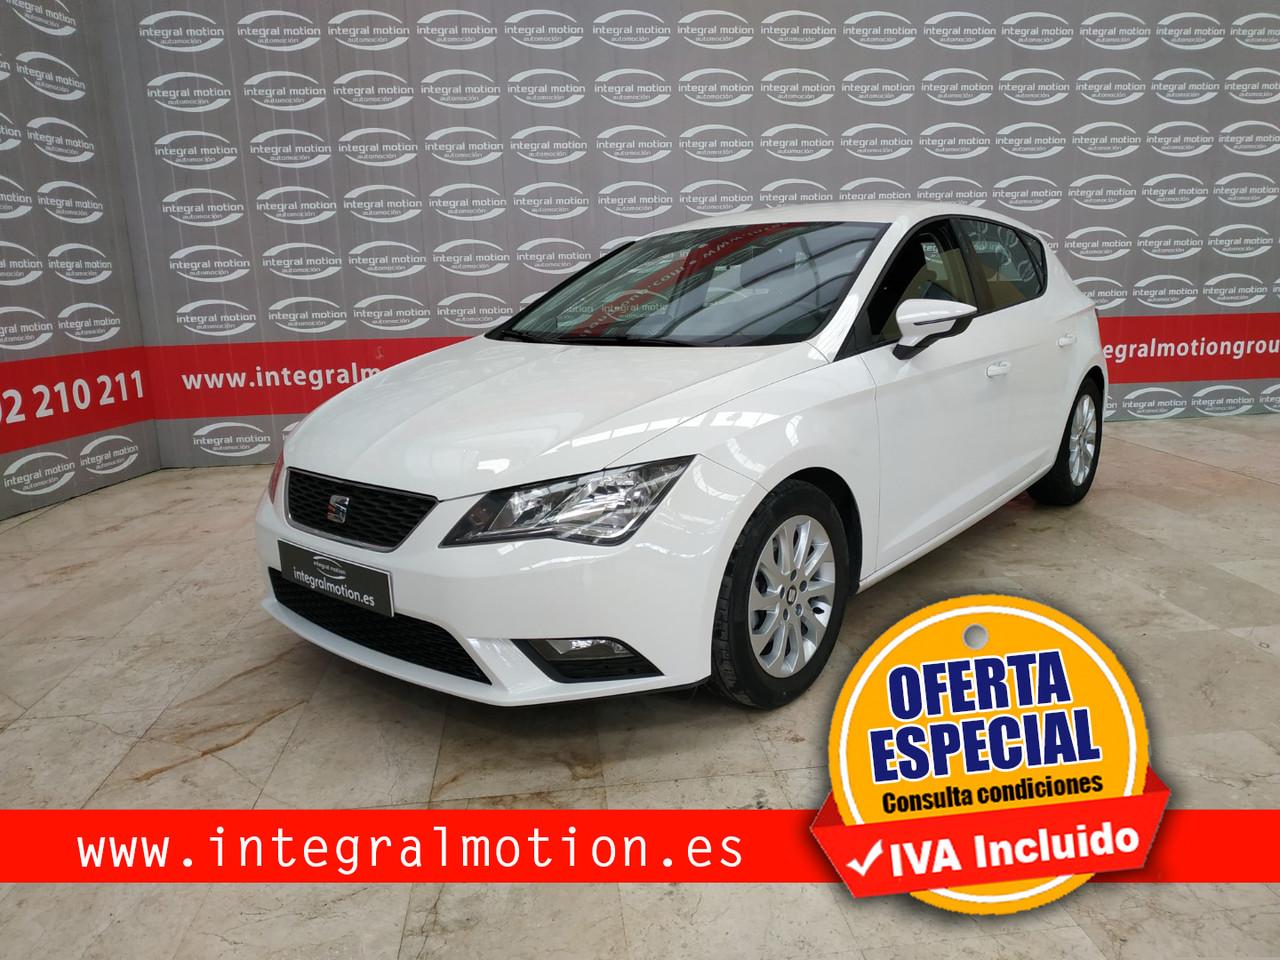 SEAT Nuevo León 1.2 TSI 105cv St&Sp Style  - Foto 1